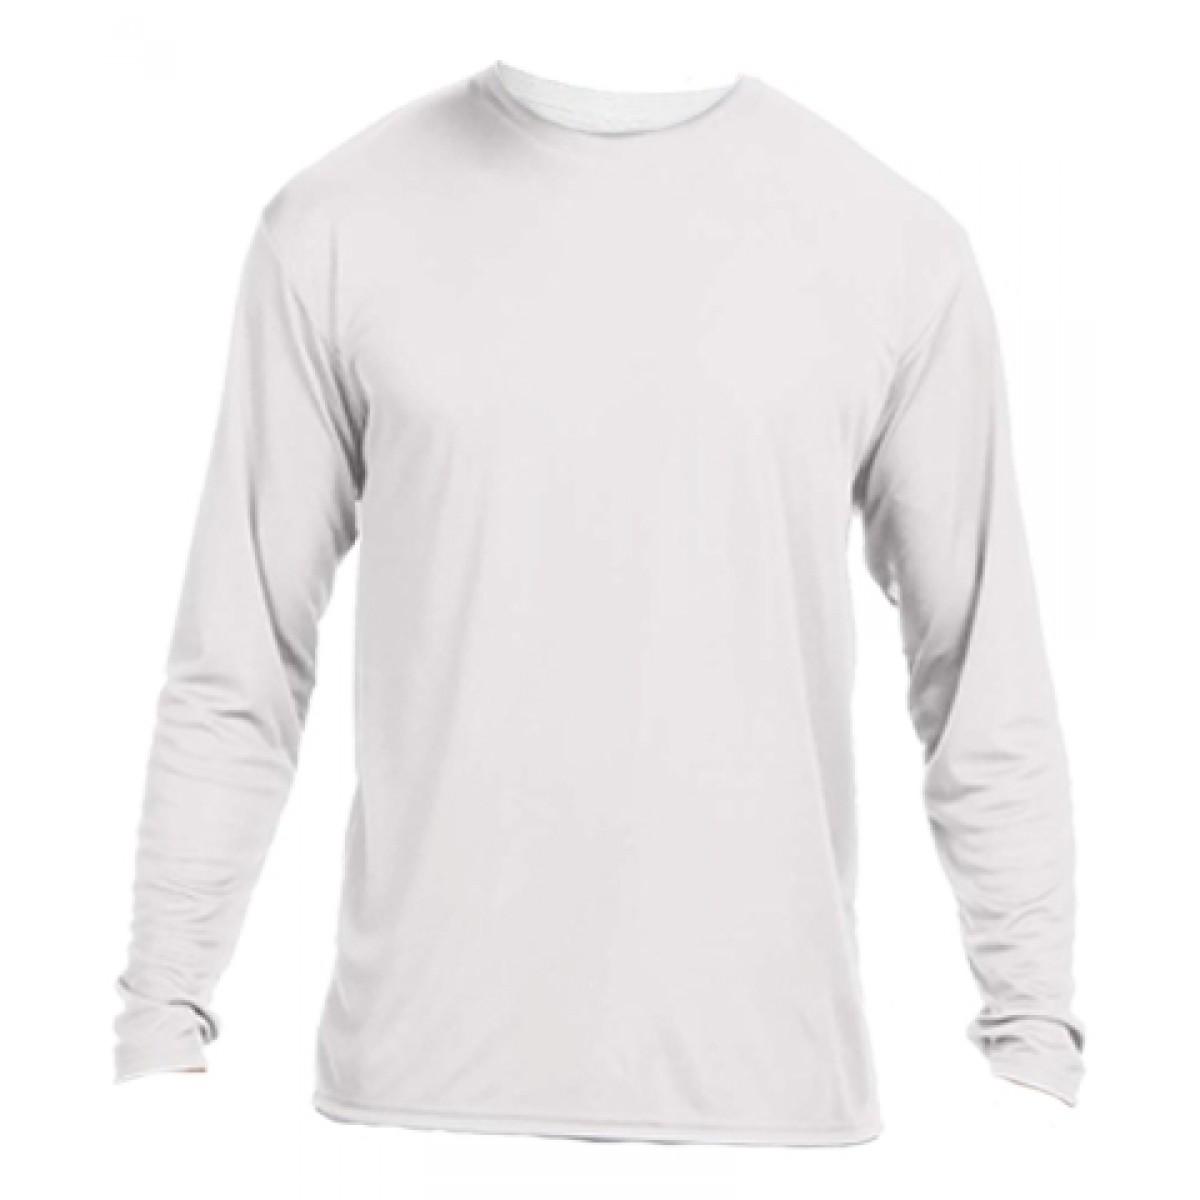 Long Sleeve Performance Tee / White